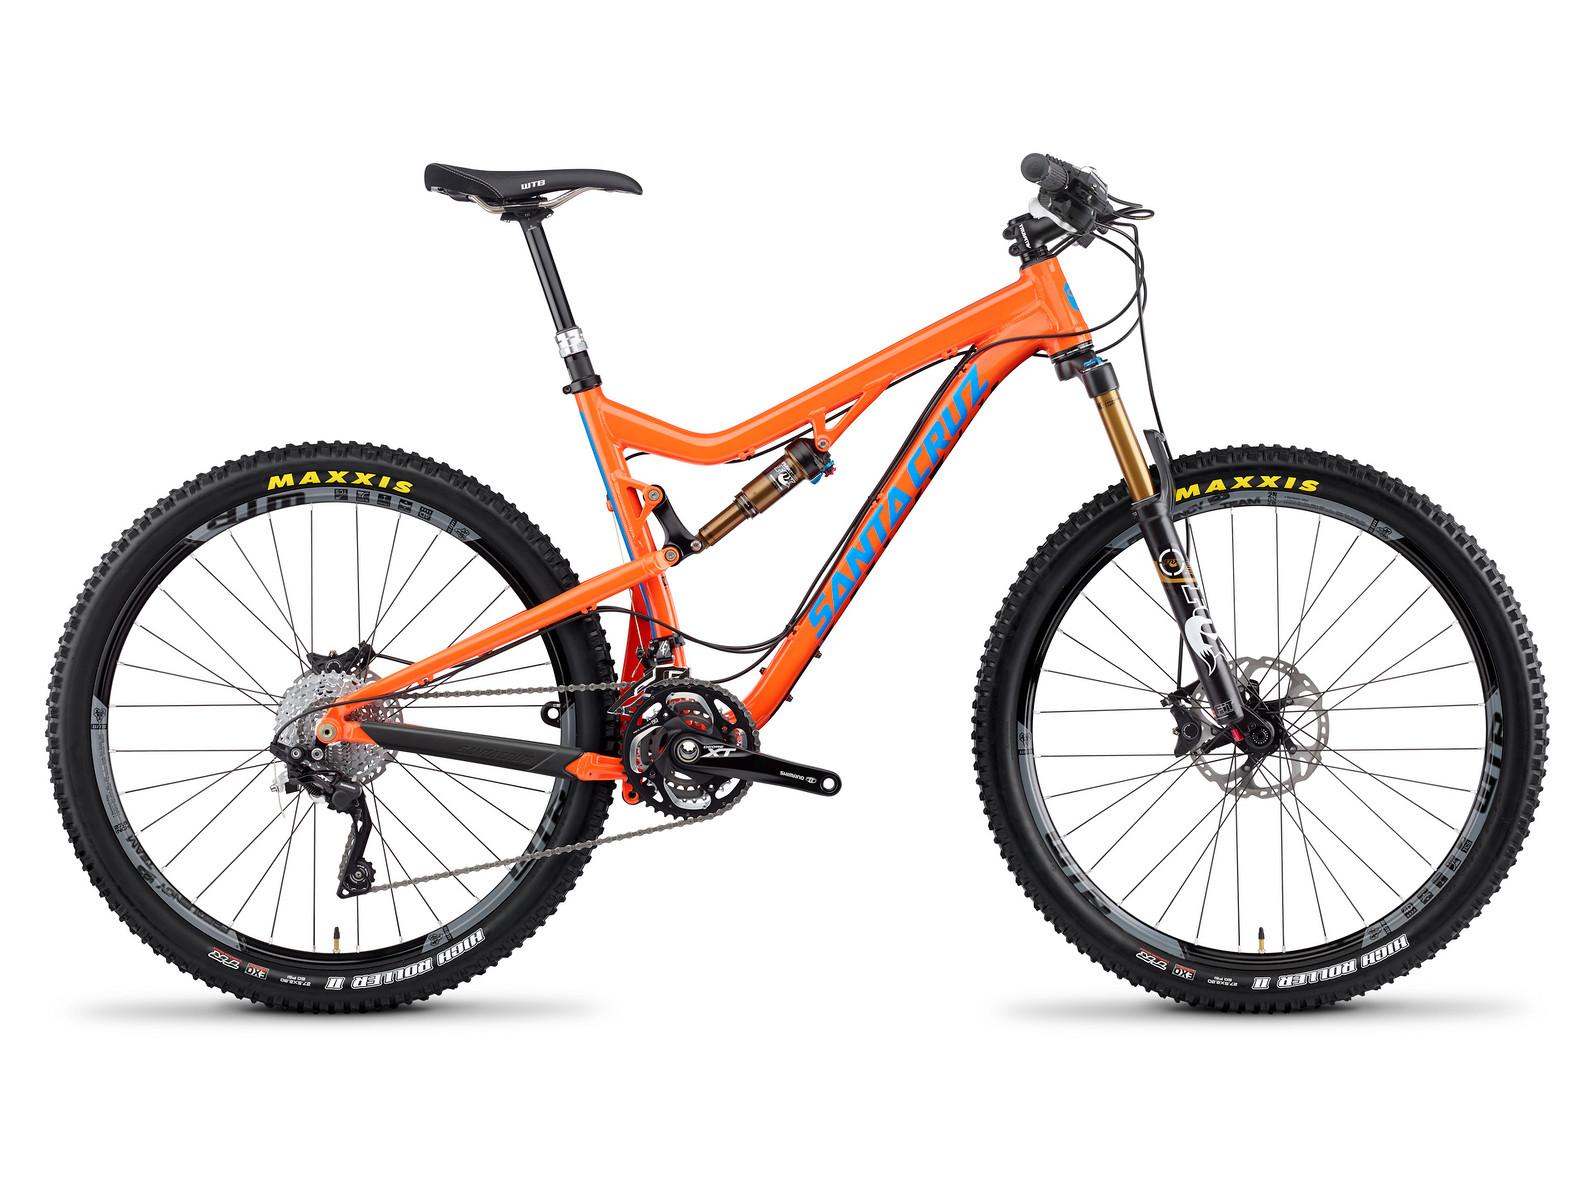 2014 Santa Cruz Solo SPX AM 27.5 Bike Solo_profile_Aluminum_ORG